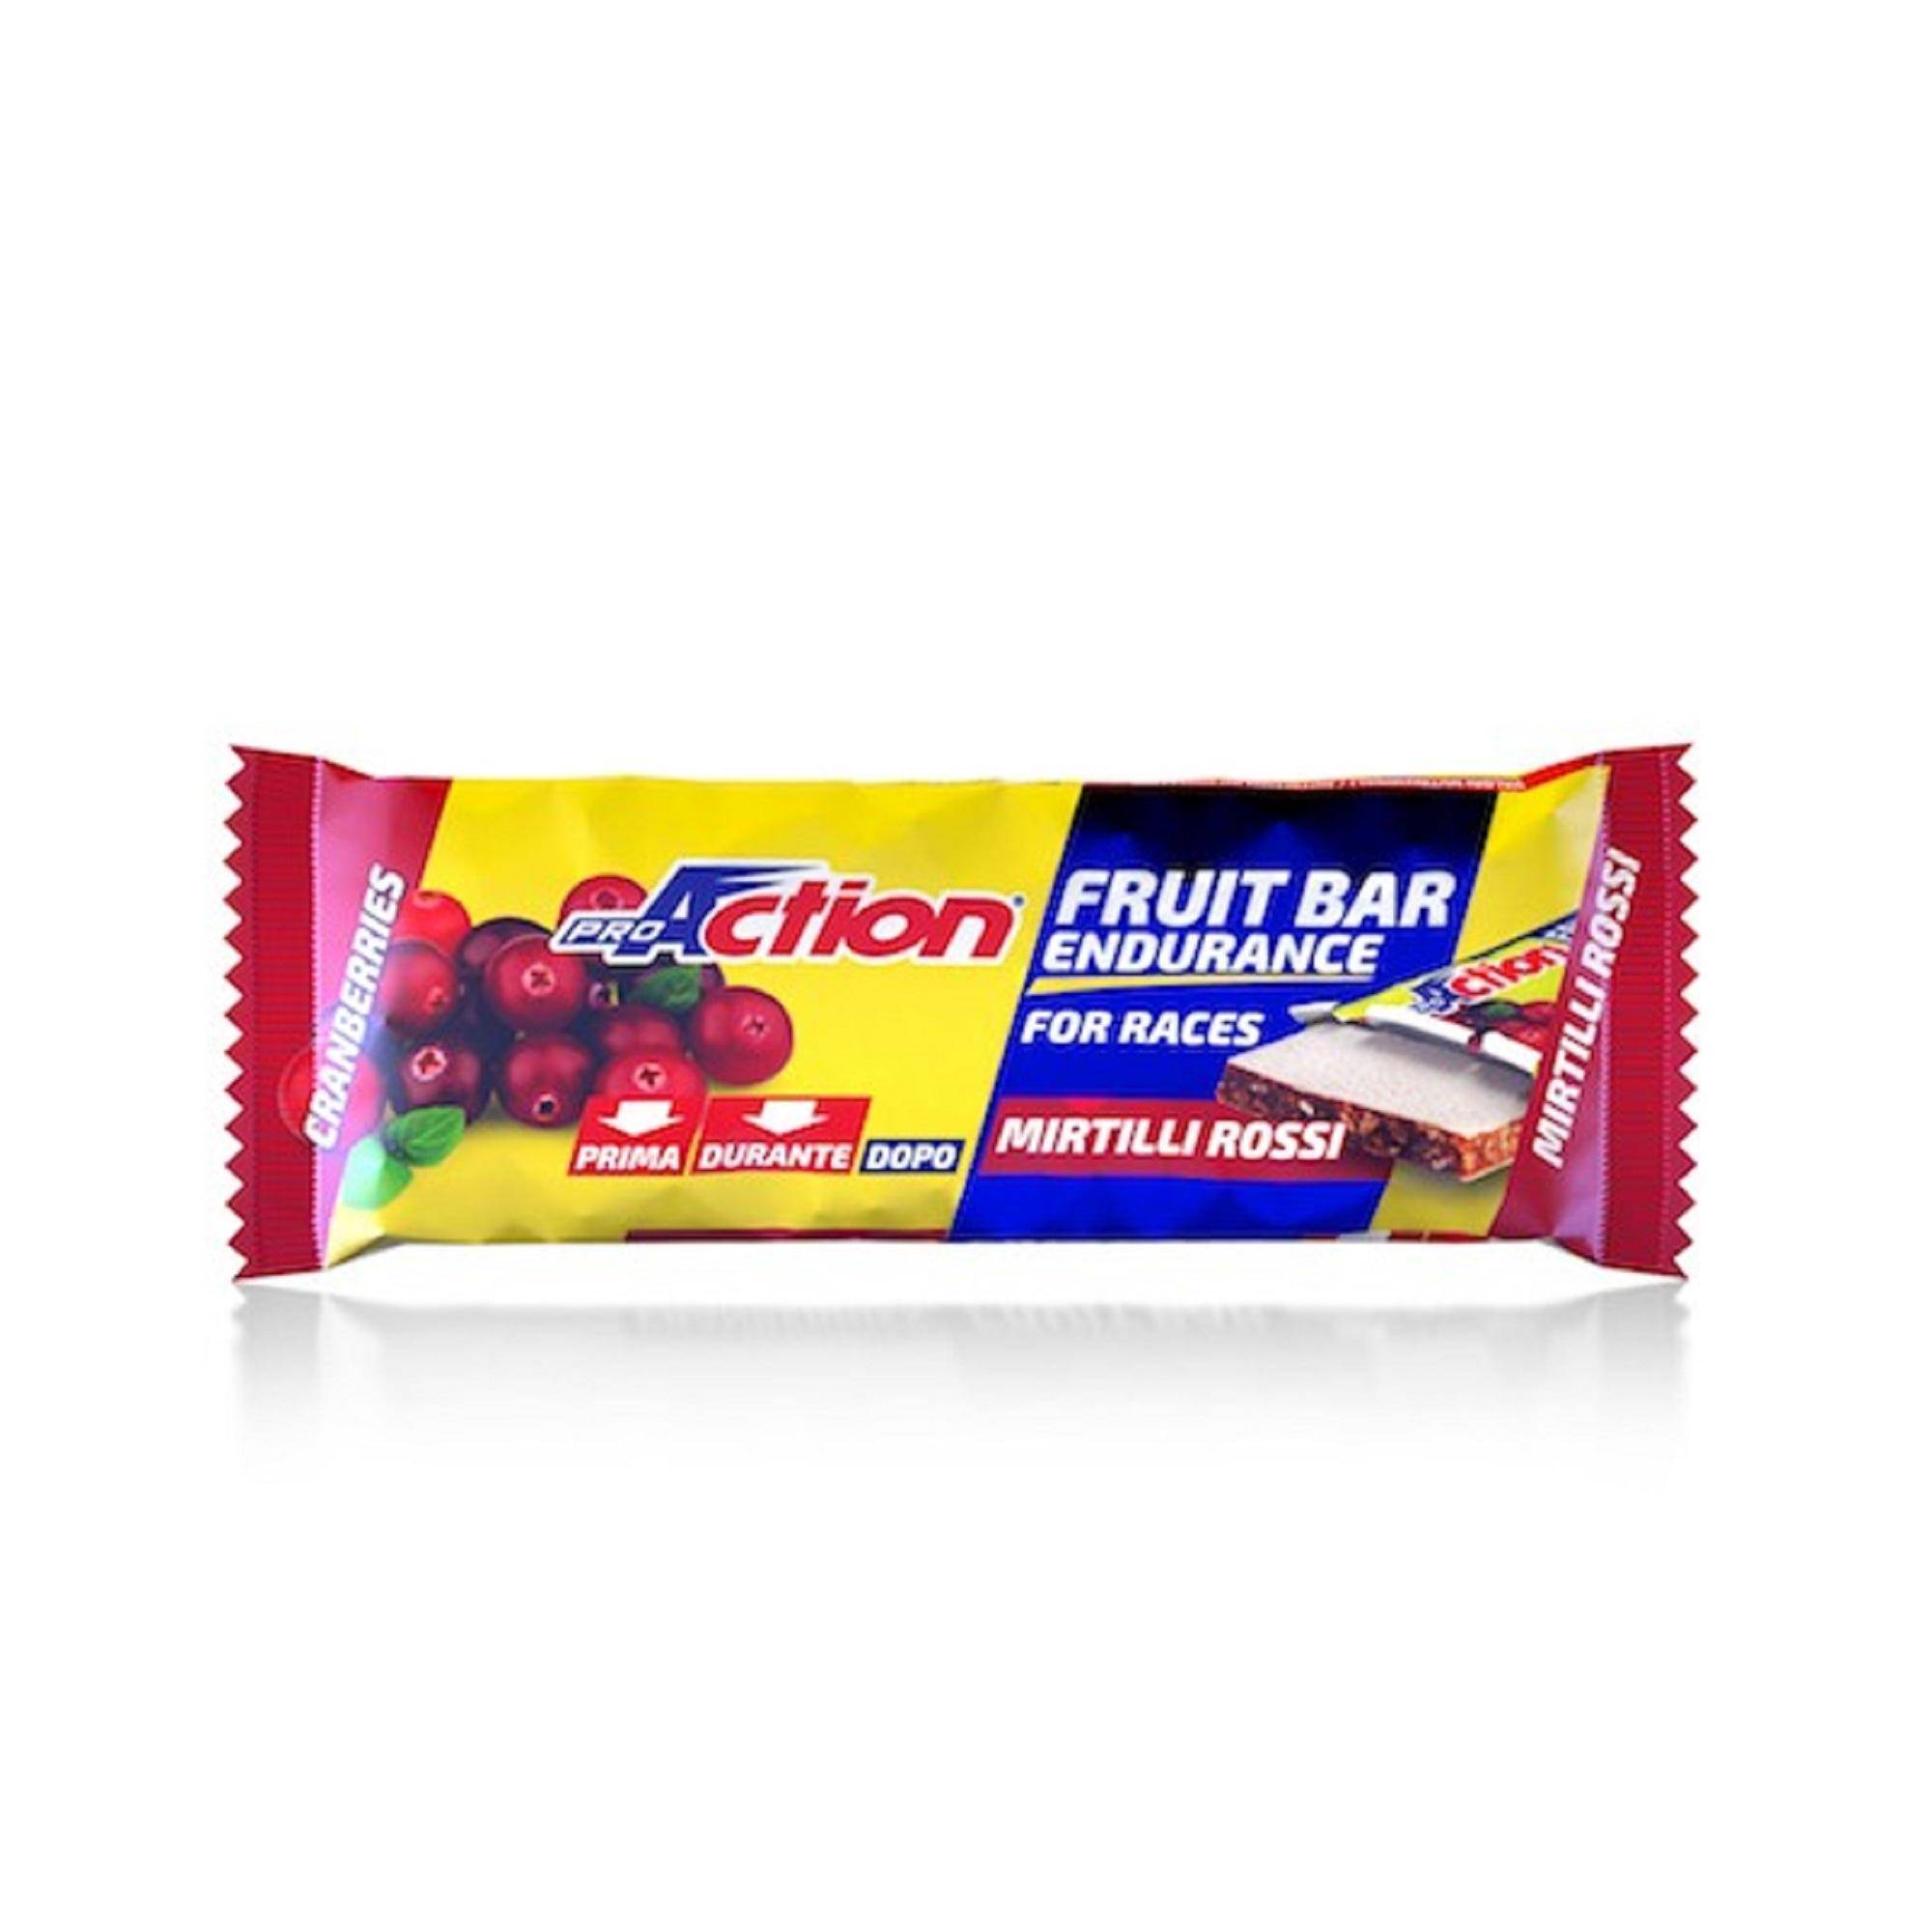 proaction barretta fruit bar endurance for races mirtillo rosso 40 g